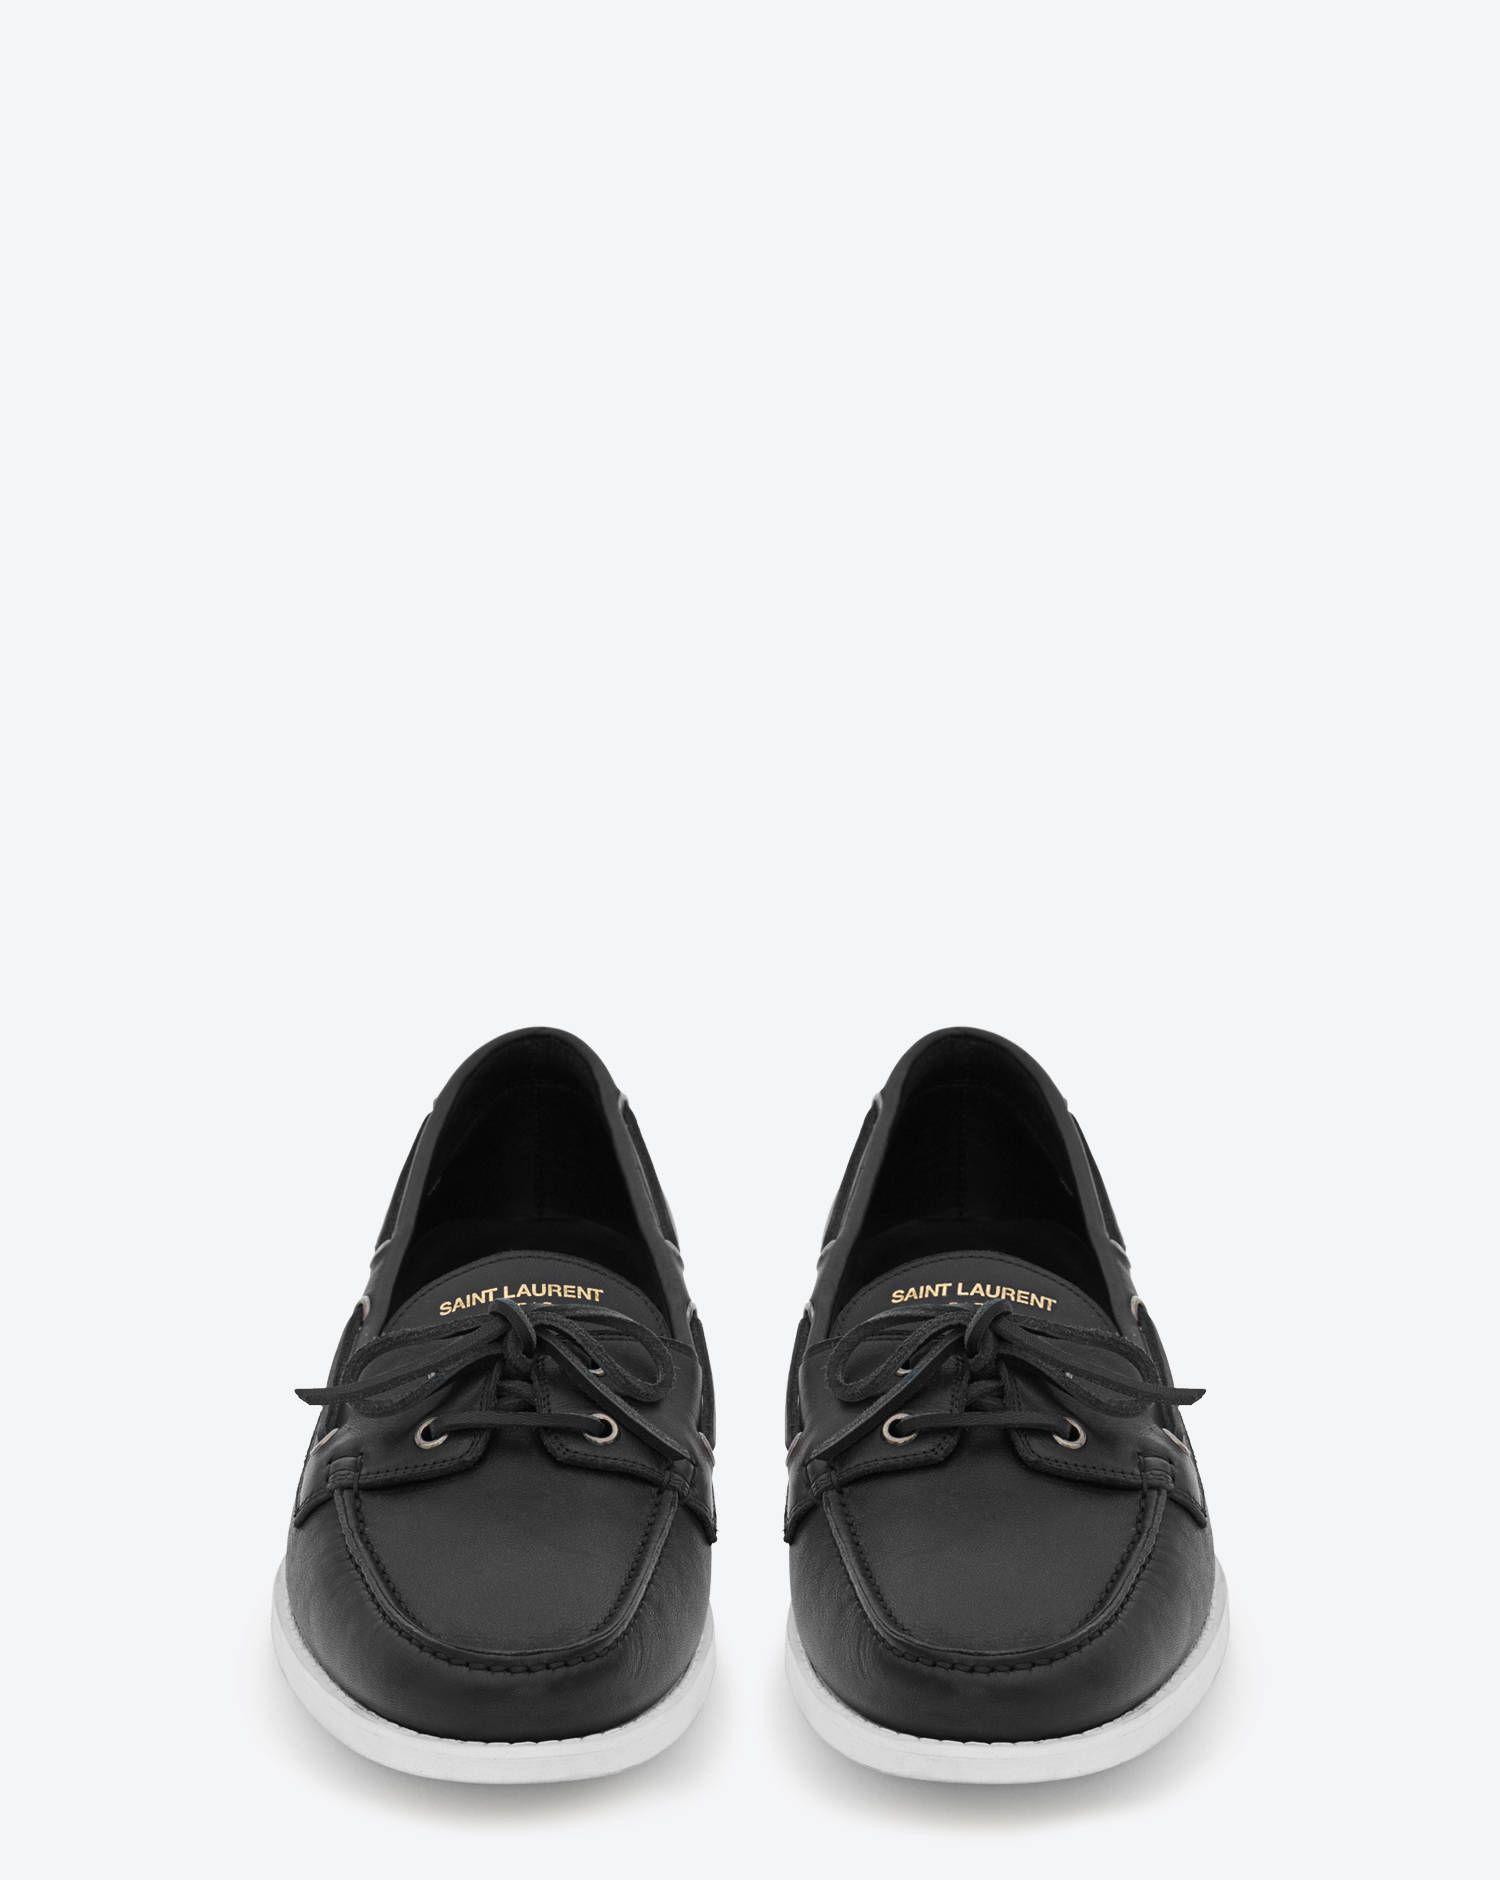 ysl classic shoes